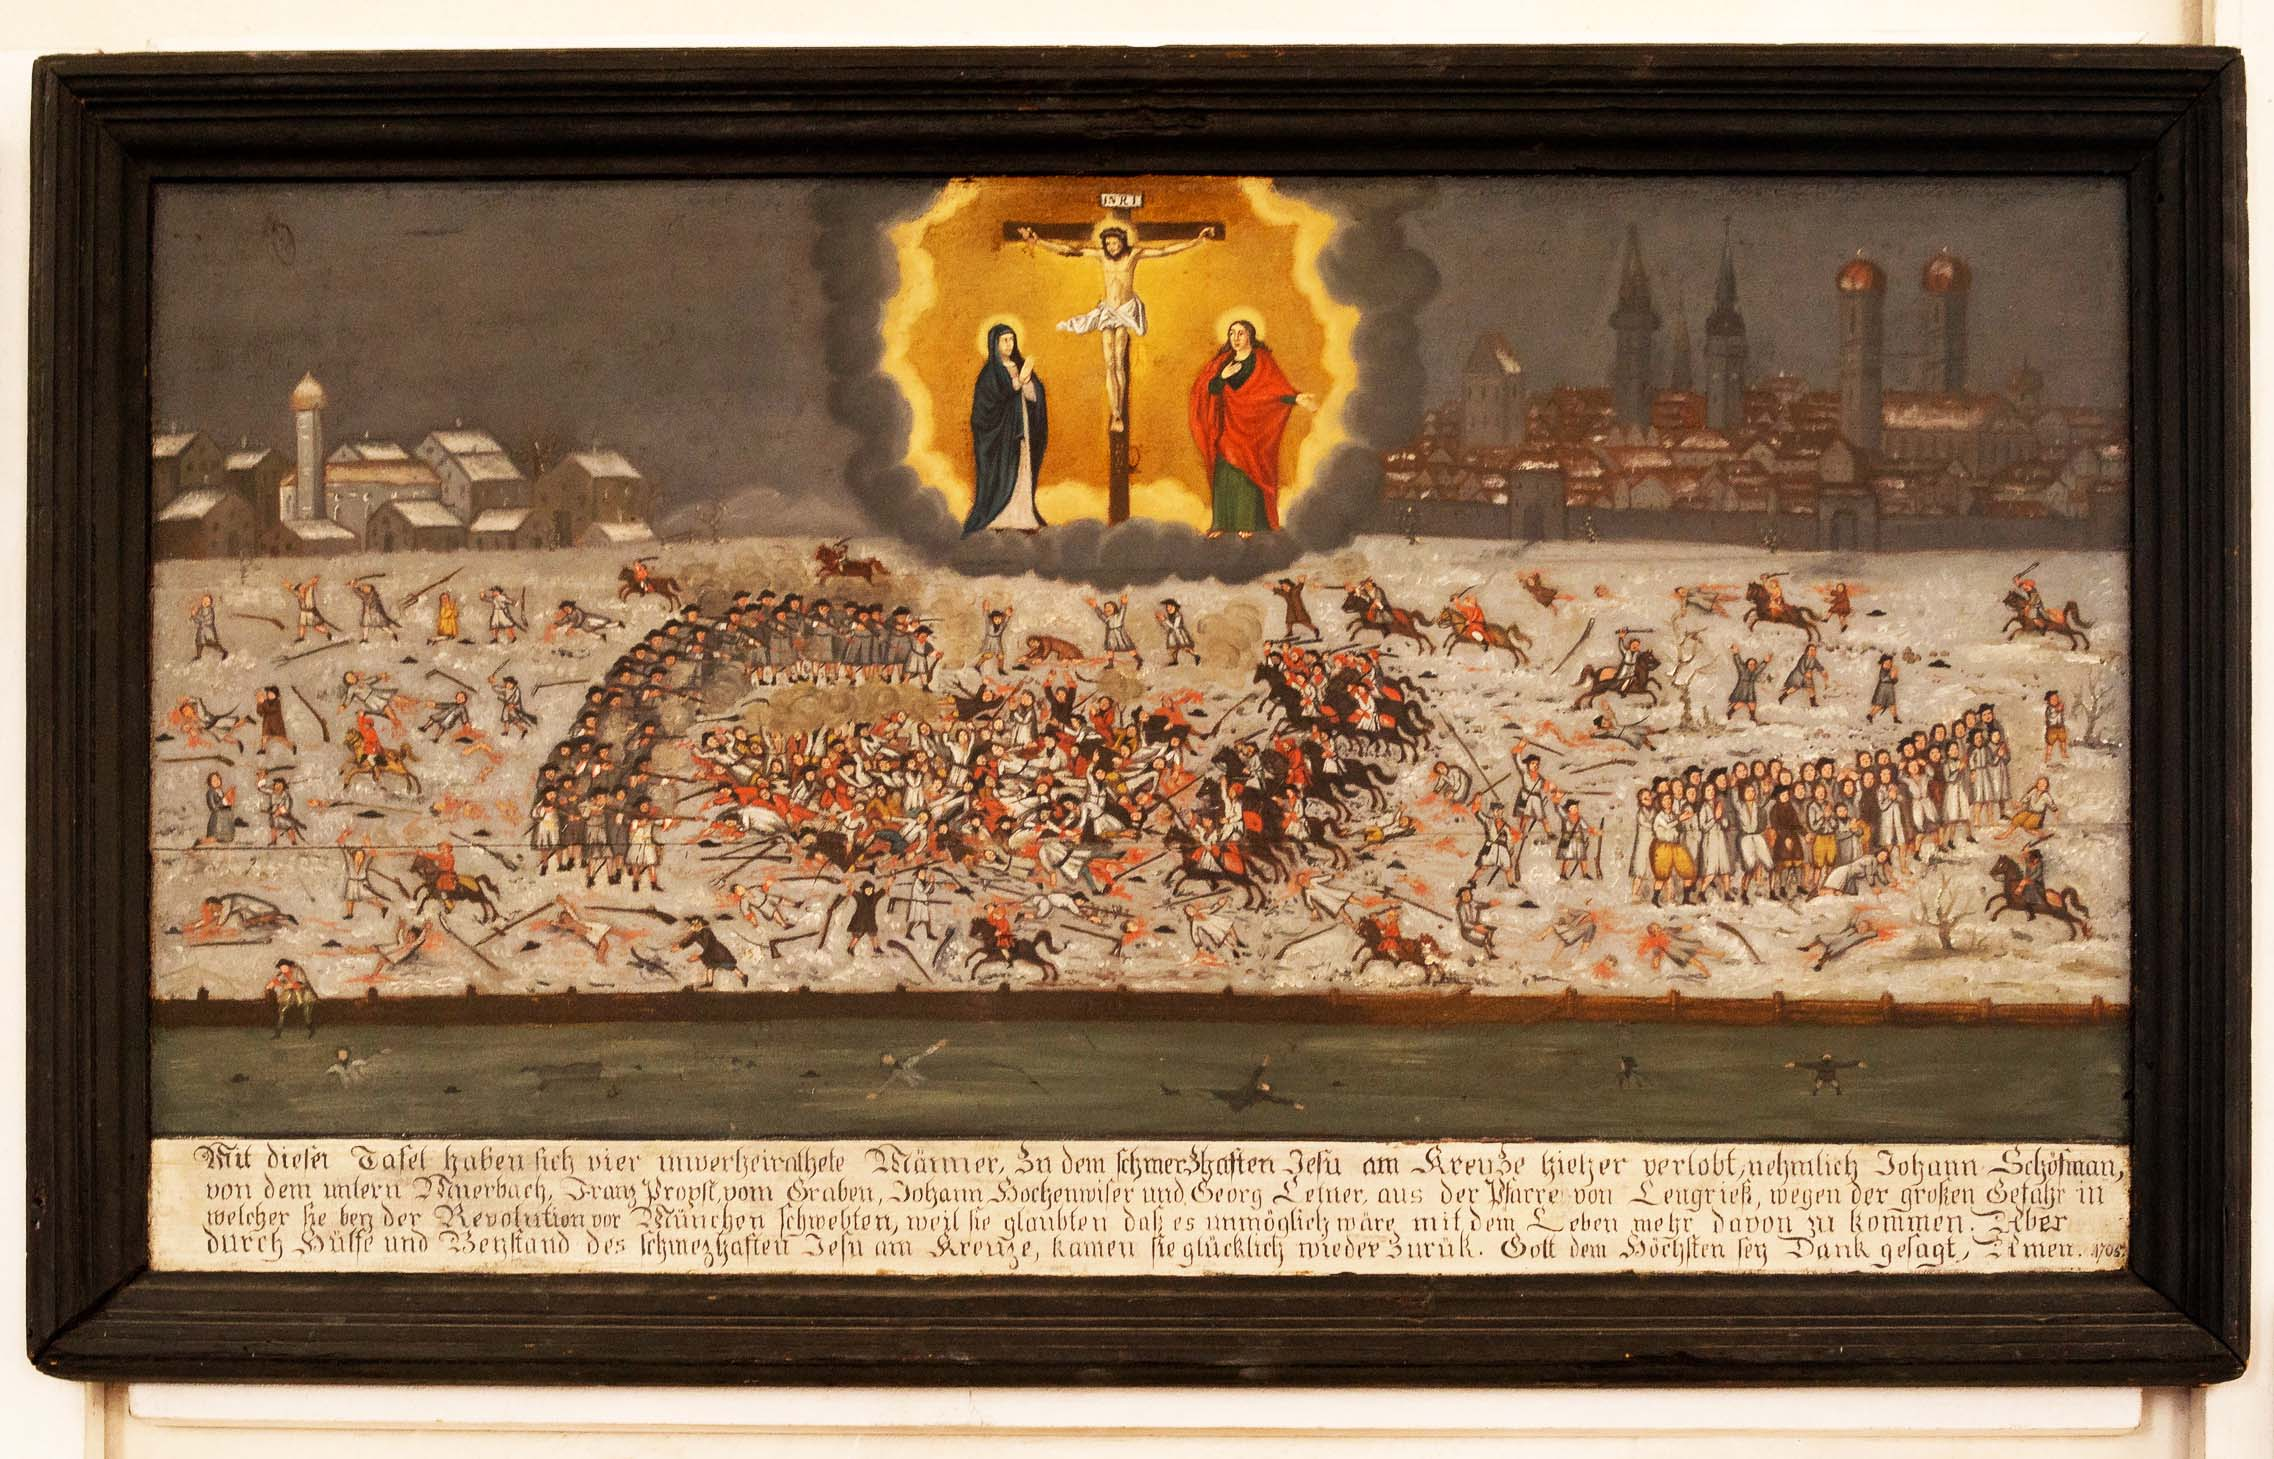 Sendlinger Mordweihnacht 1705, Kalvarienberg Lenggries, Kapelle zum schmerzhaften Jesu am Kreuze, 11. Februar 2014